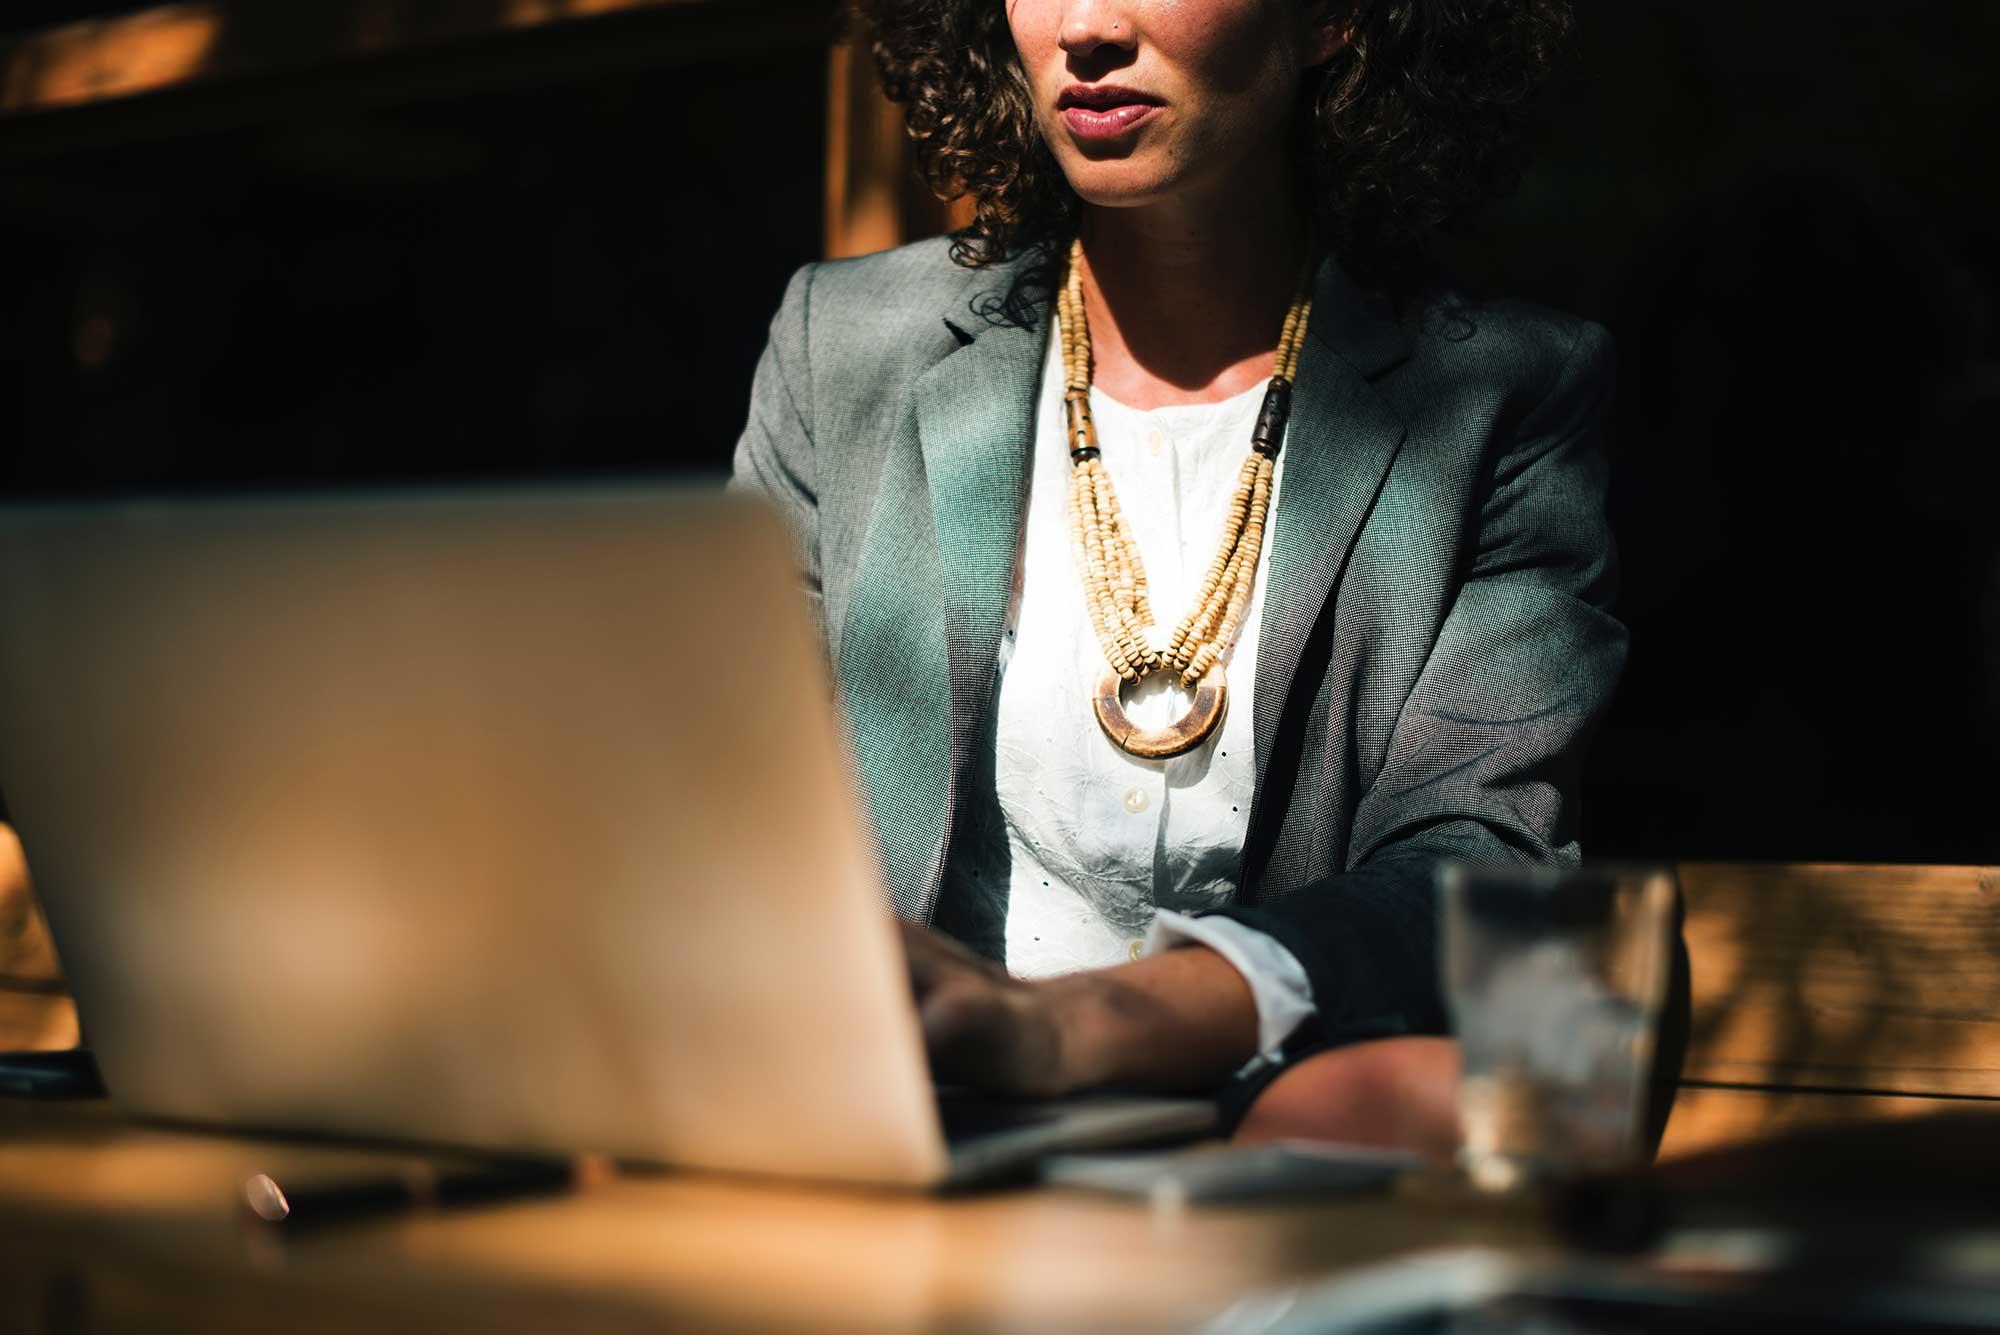 Woman editing website on laptop